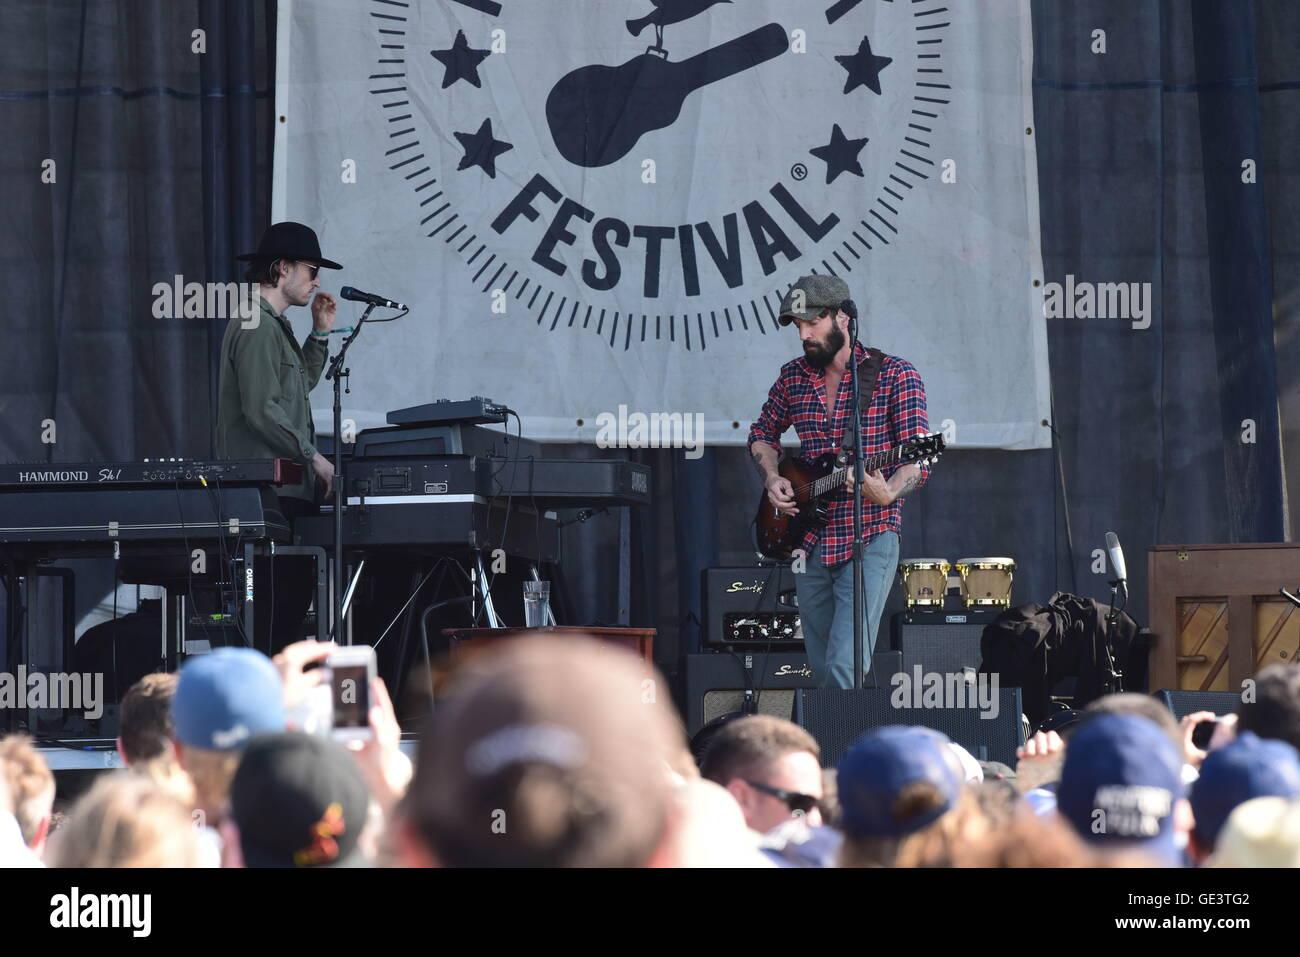 Newport, RI, USA. 23rd July, 2016. Ray LaMontange at the 2016 Newport Folk Festival. Newport, RI. 7/23/16. Sun Sentinel - Stock Image